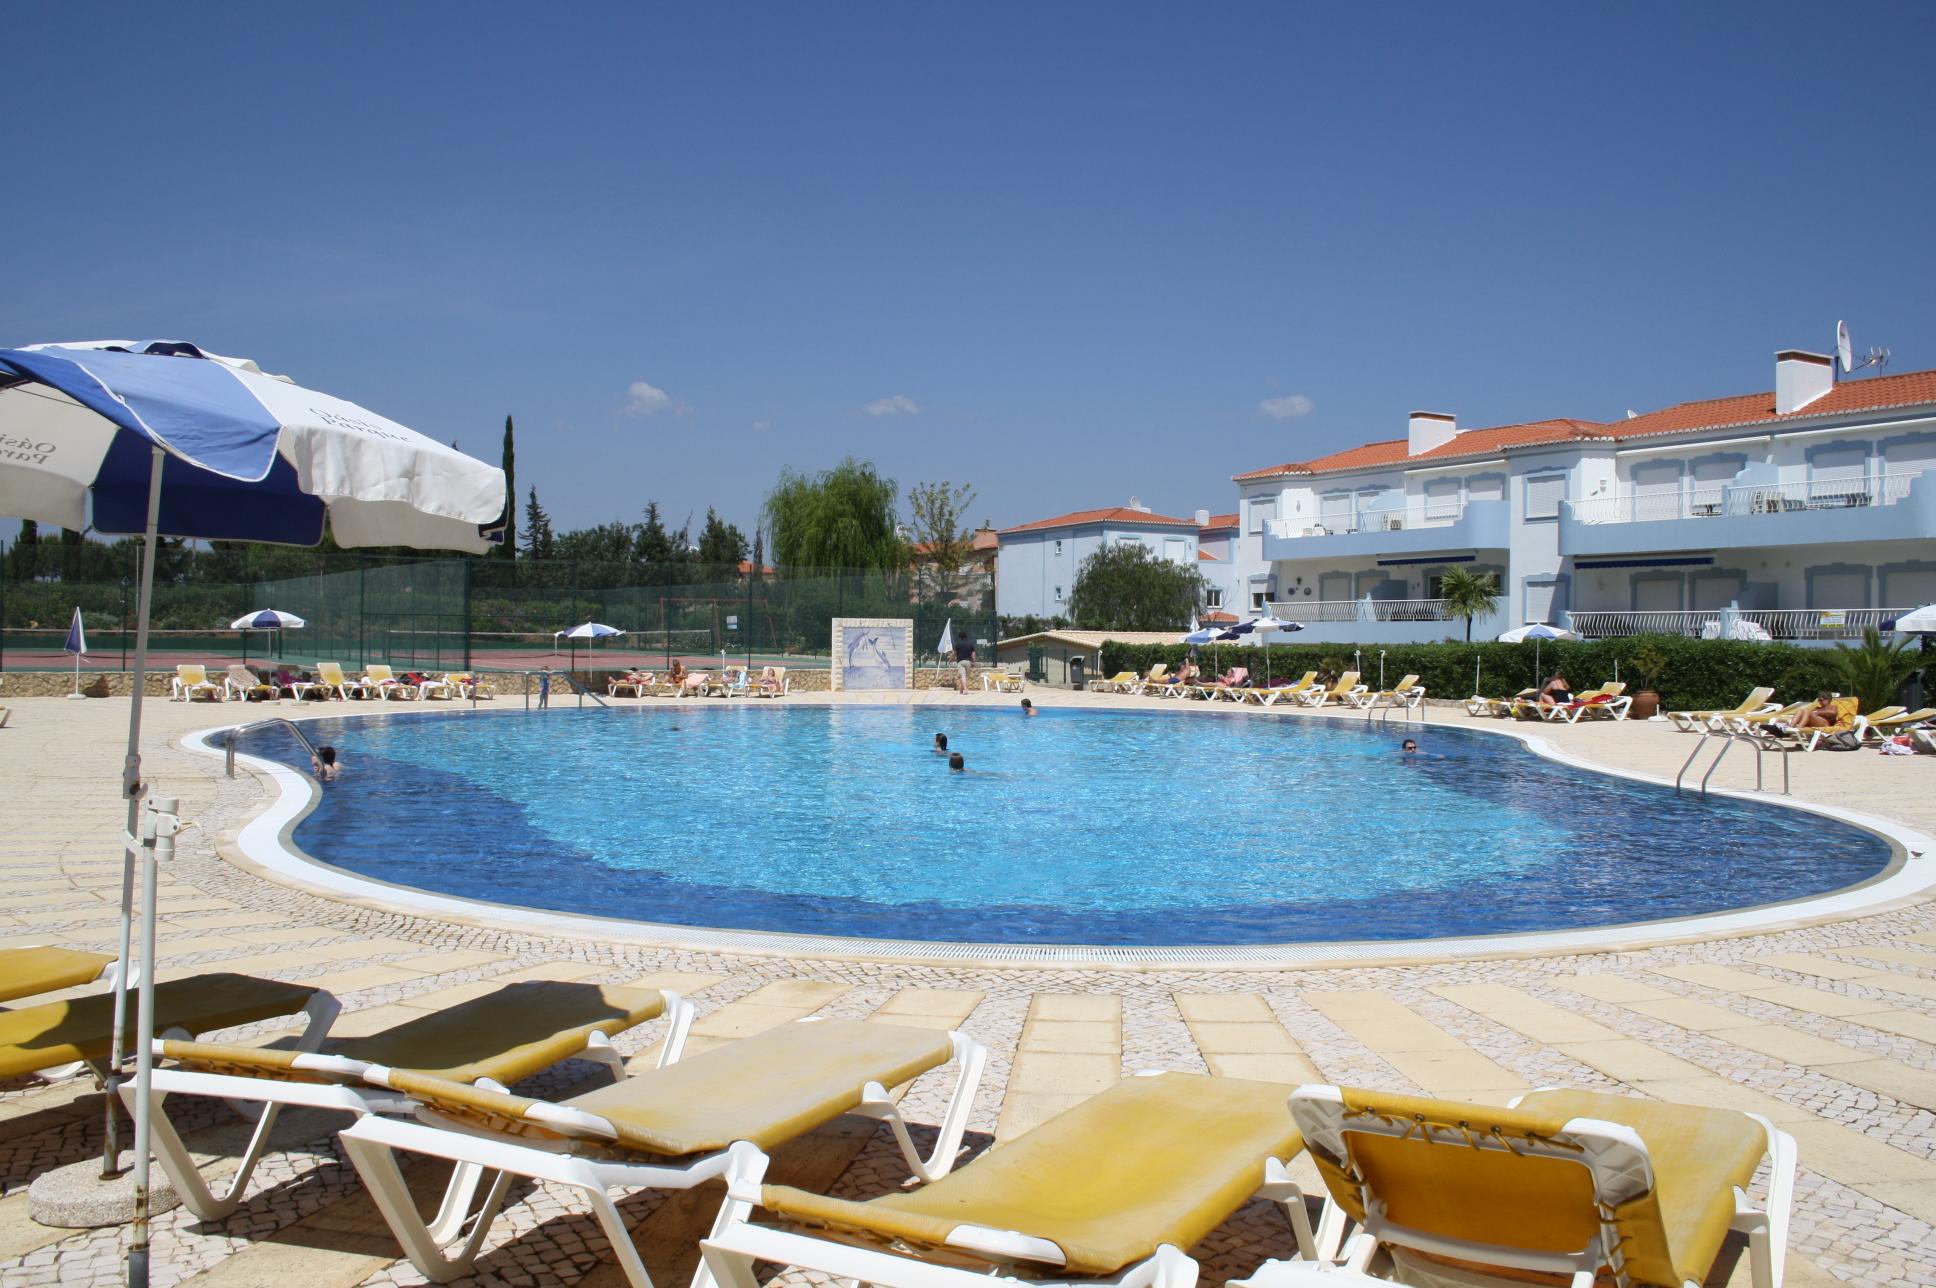 Oasis Parque Pool